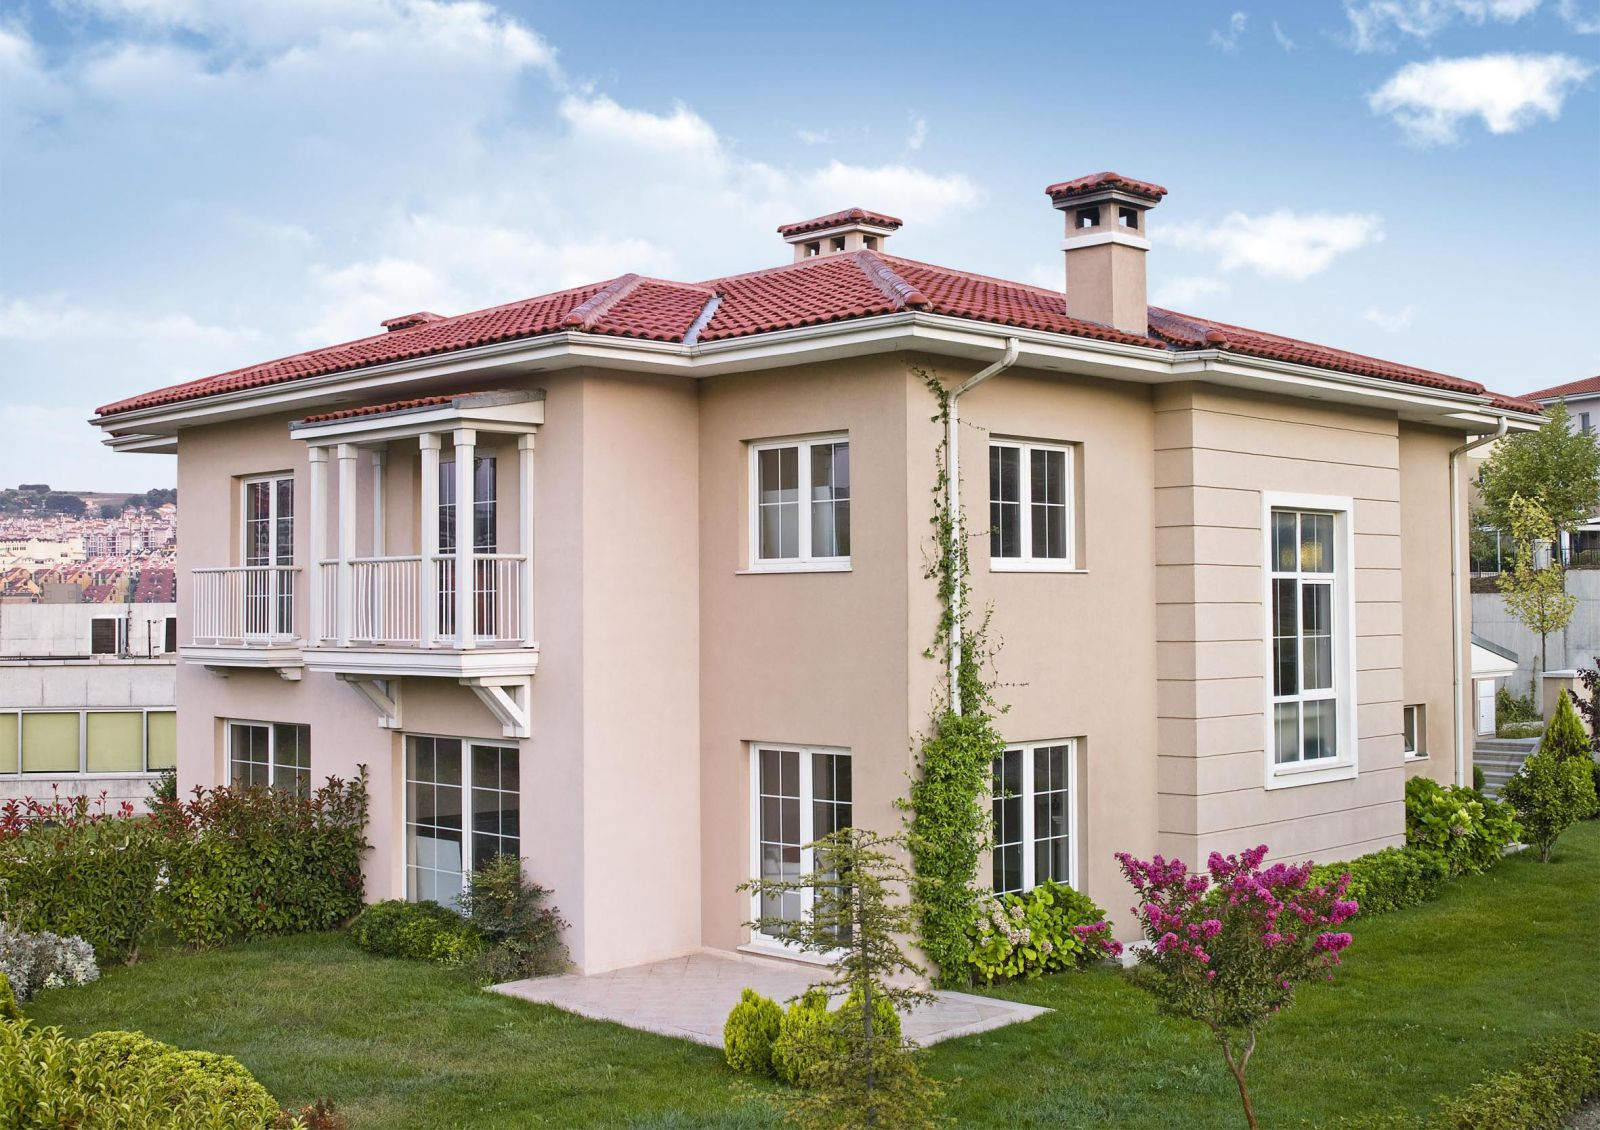 Uae design house - House design